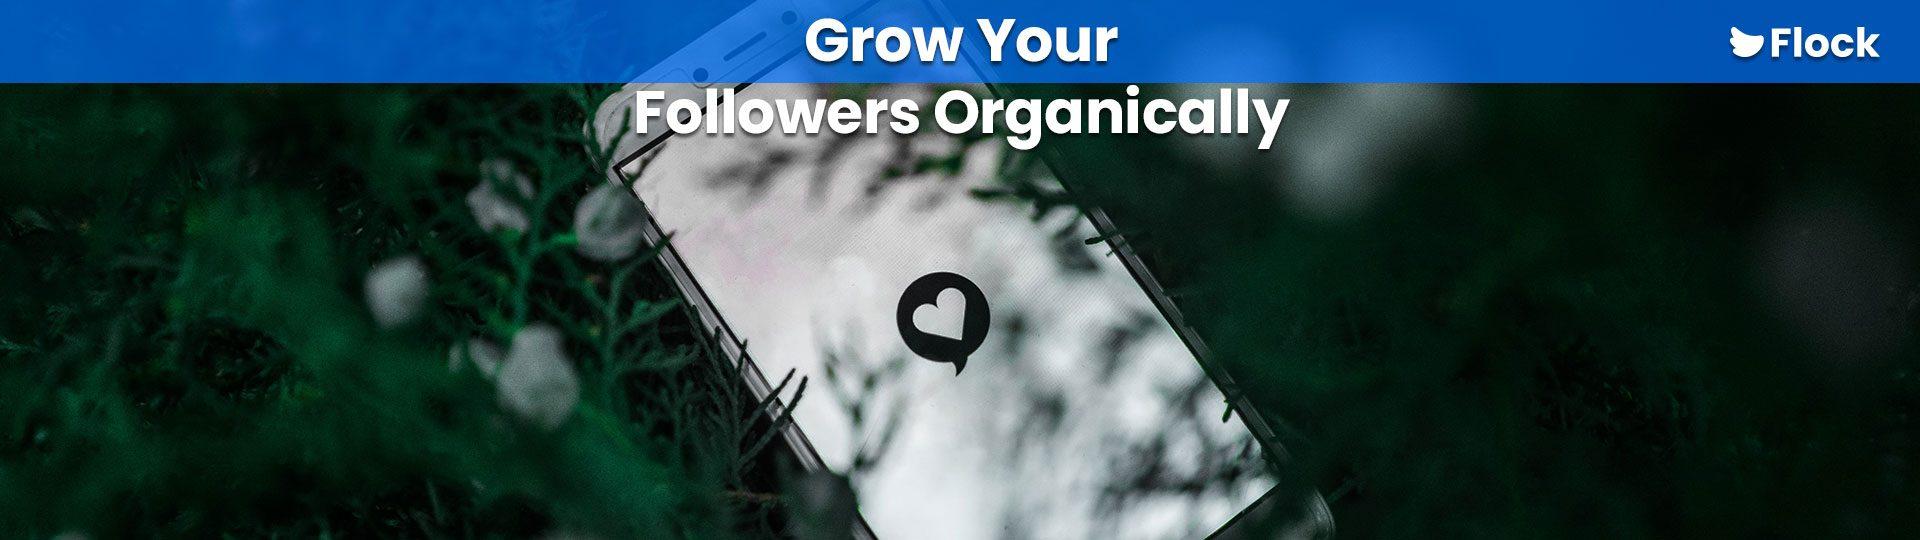 Grow Your Followers Organically